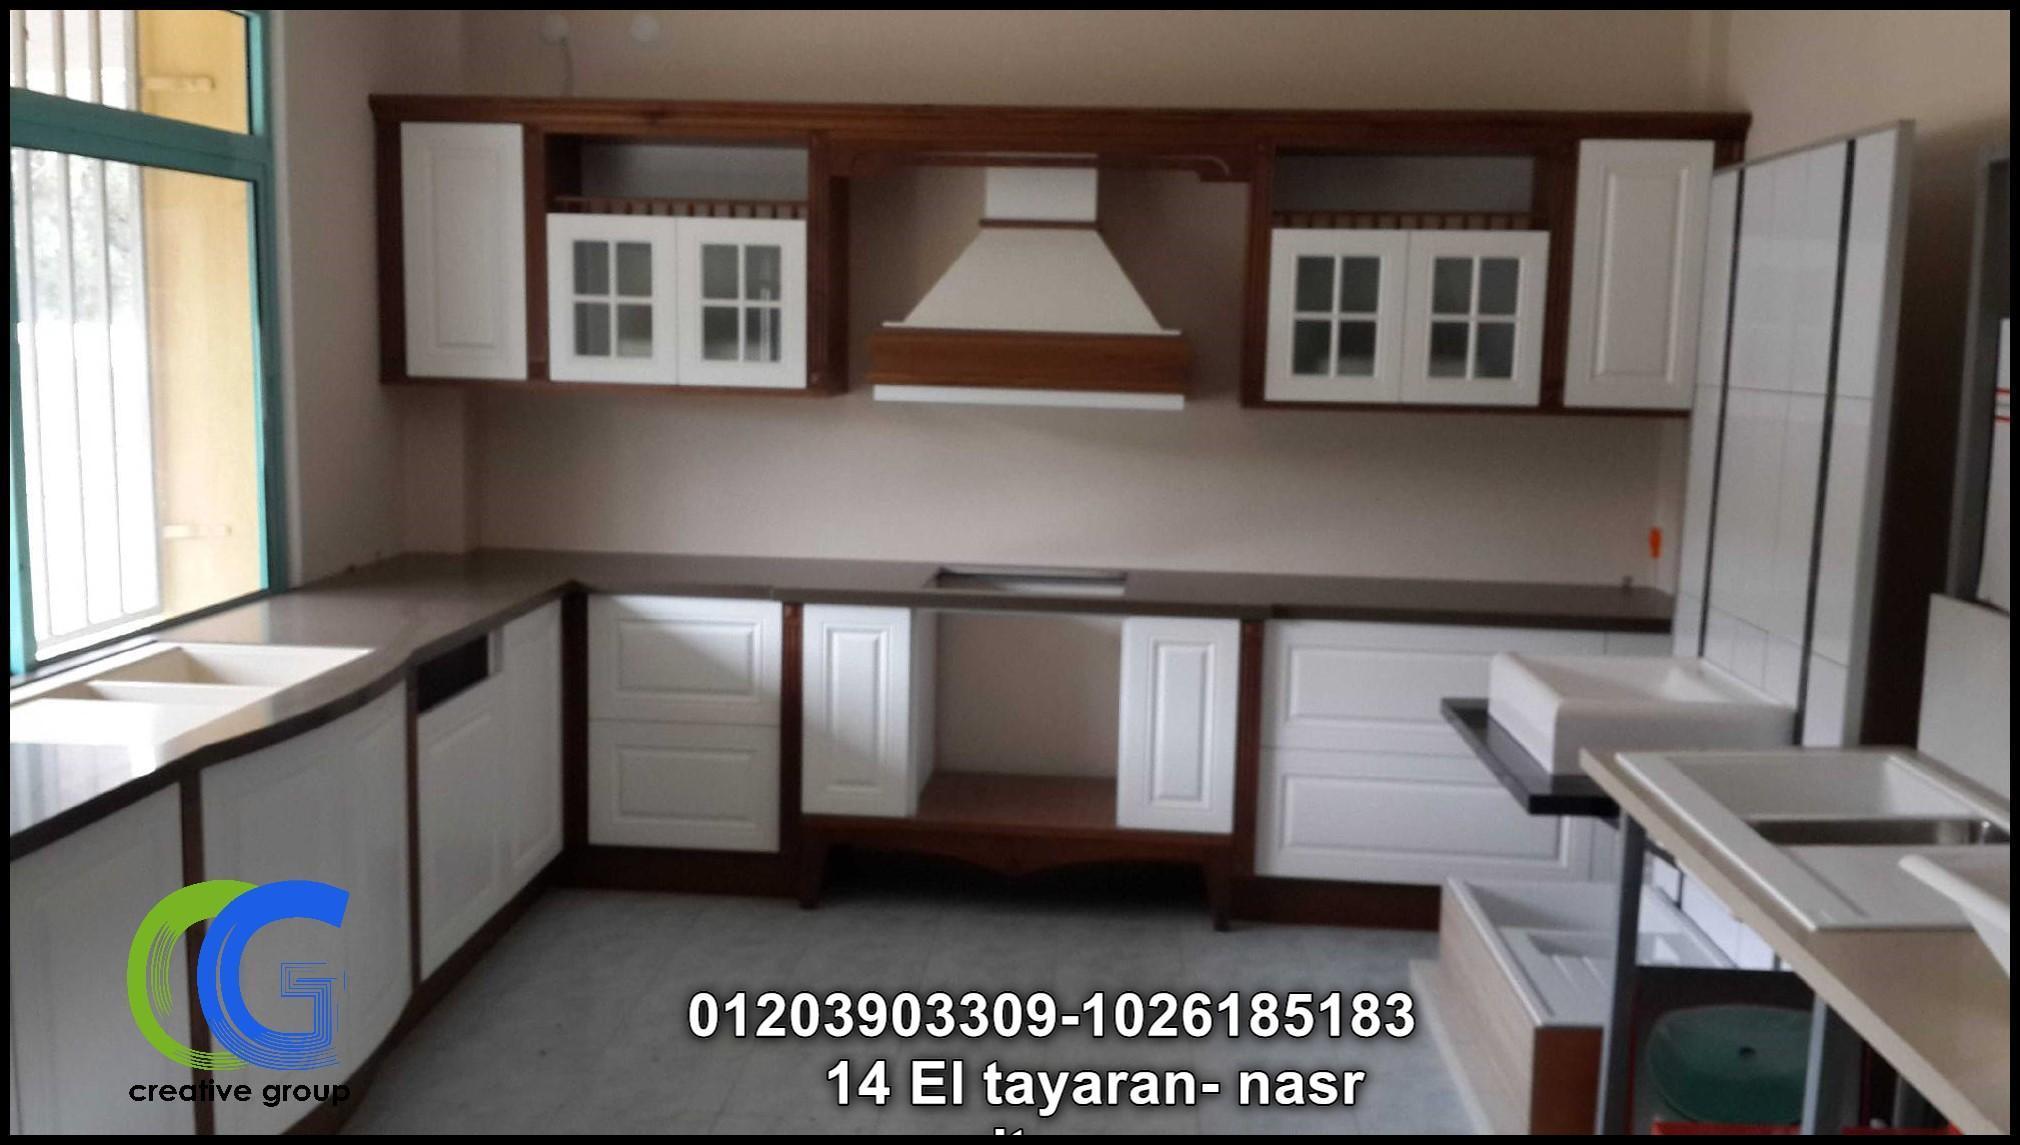 مطبخ خشب ( اسعار مميزة )- كرياتف جروب 01203903309  359430266